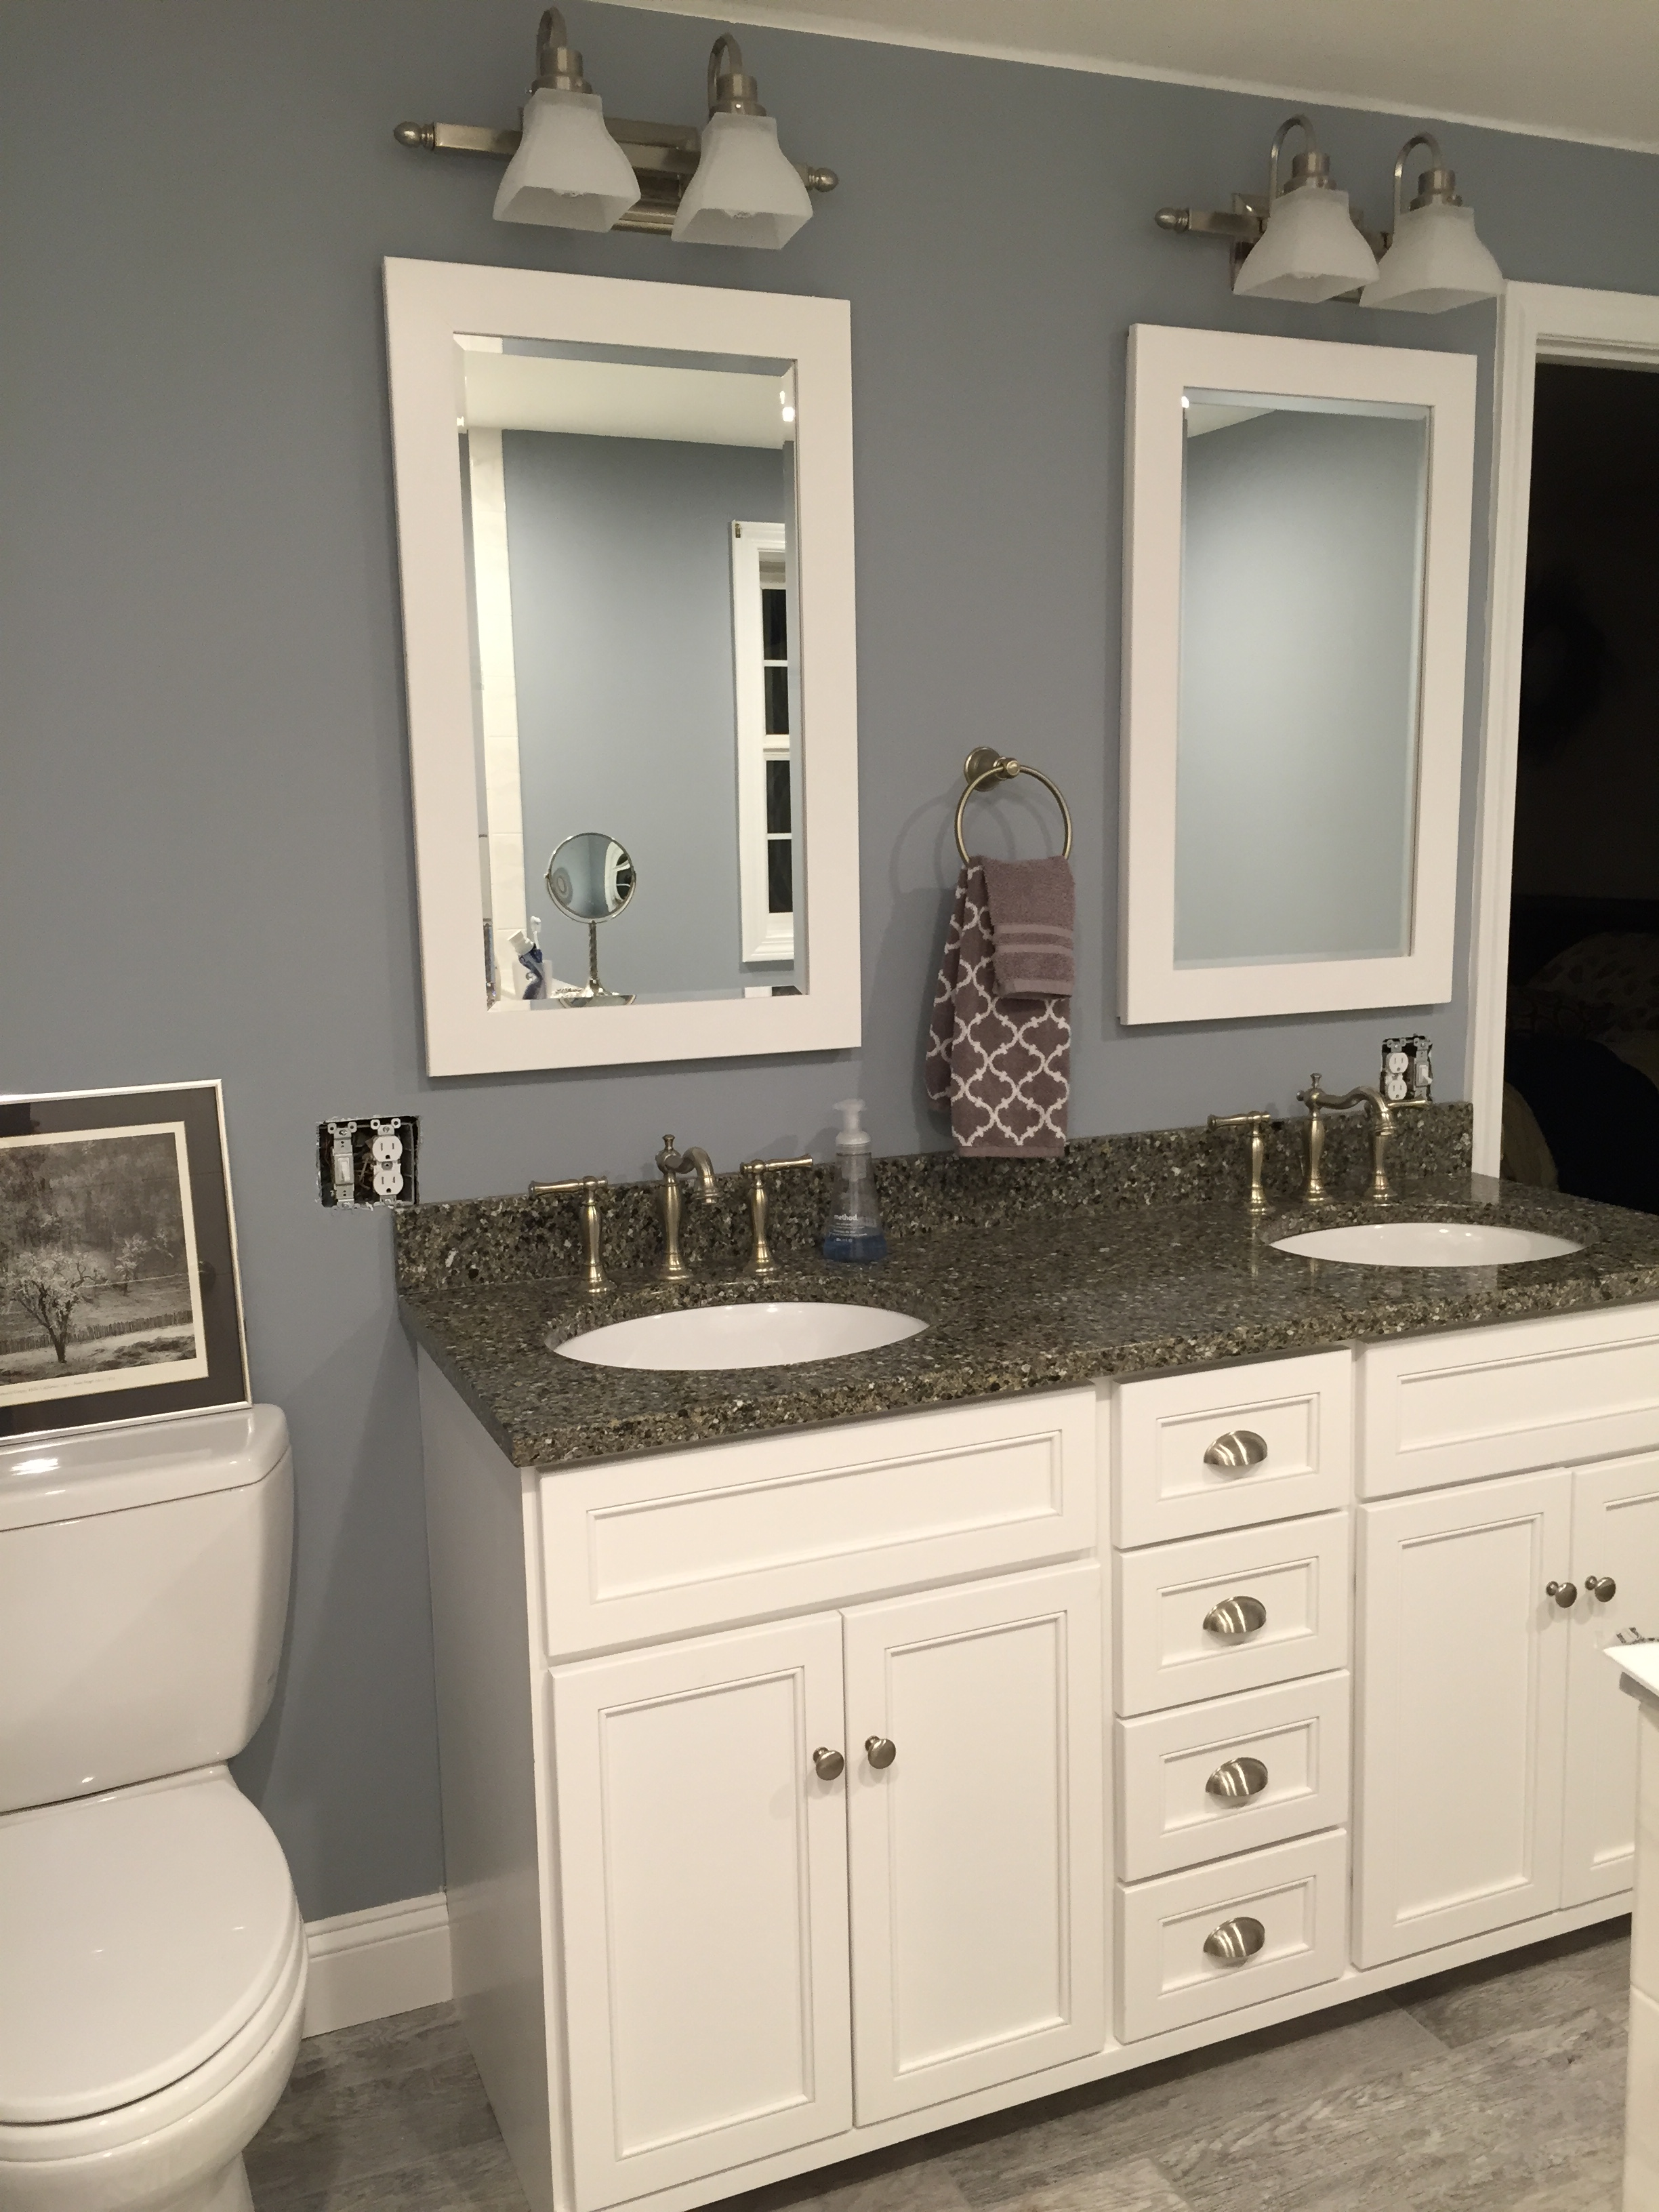 Bathroom Remodel Nh amherst nh bathroom remodel is complete!! | allen remodeling